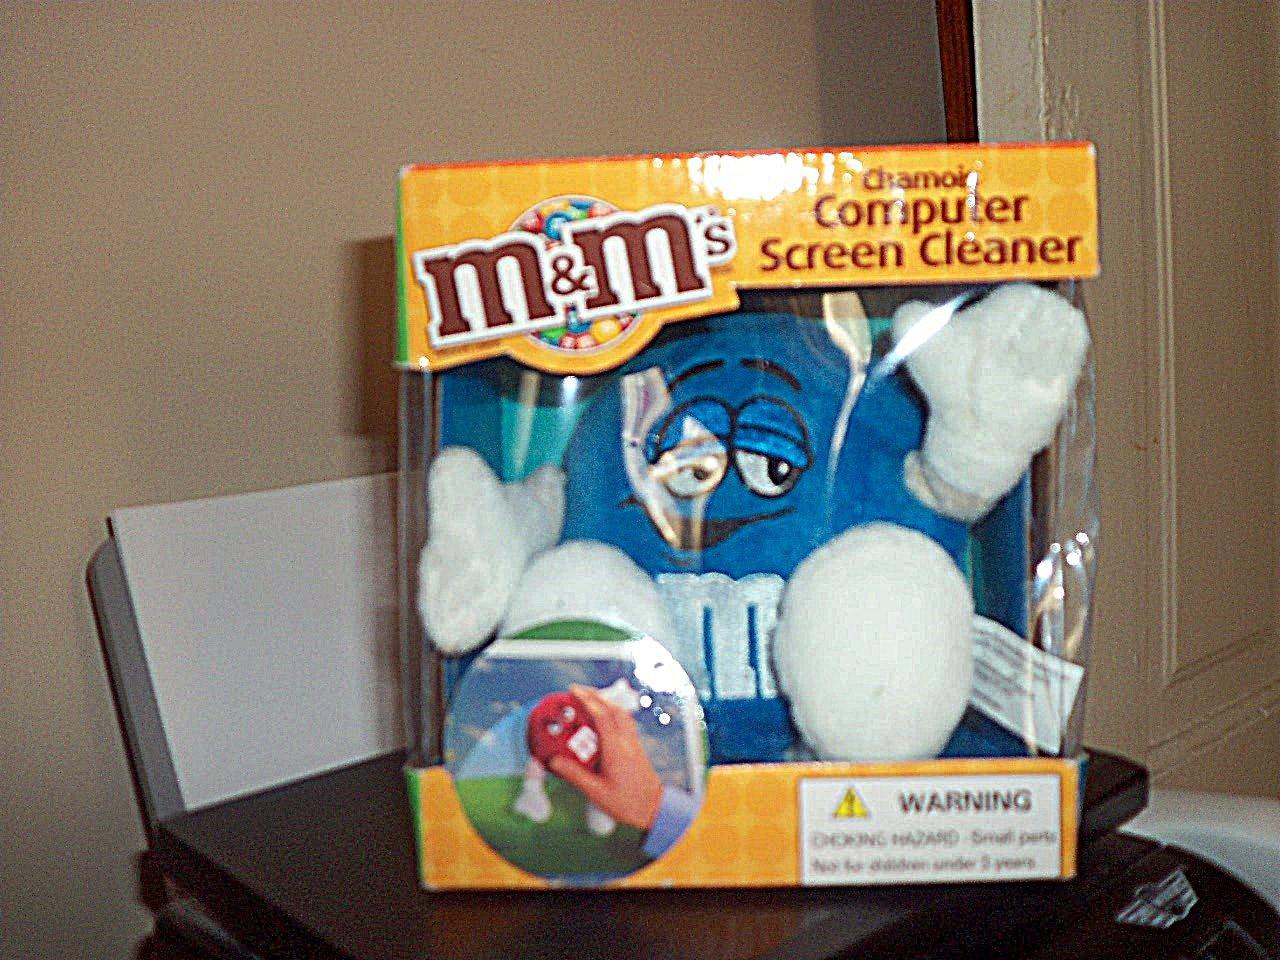 M&M's Blue Chamois Computer Screen Cleaner Soft NIB #301360